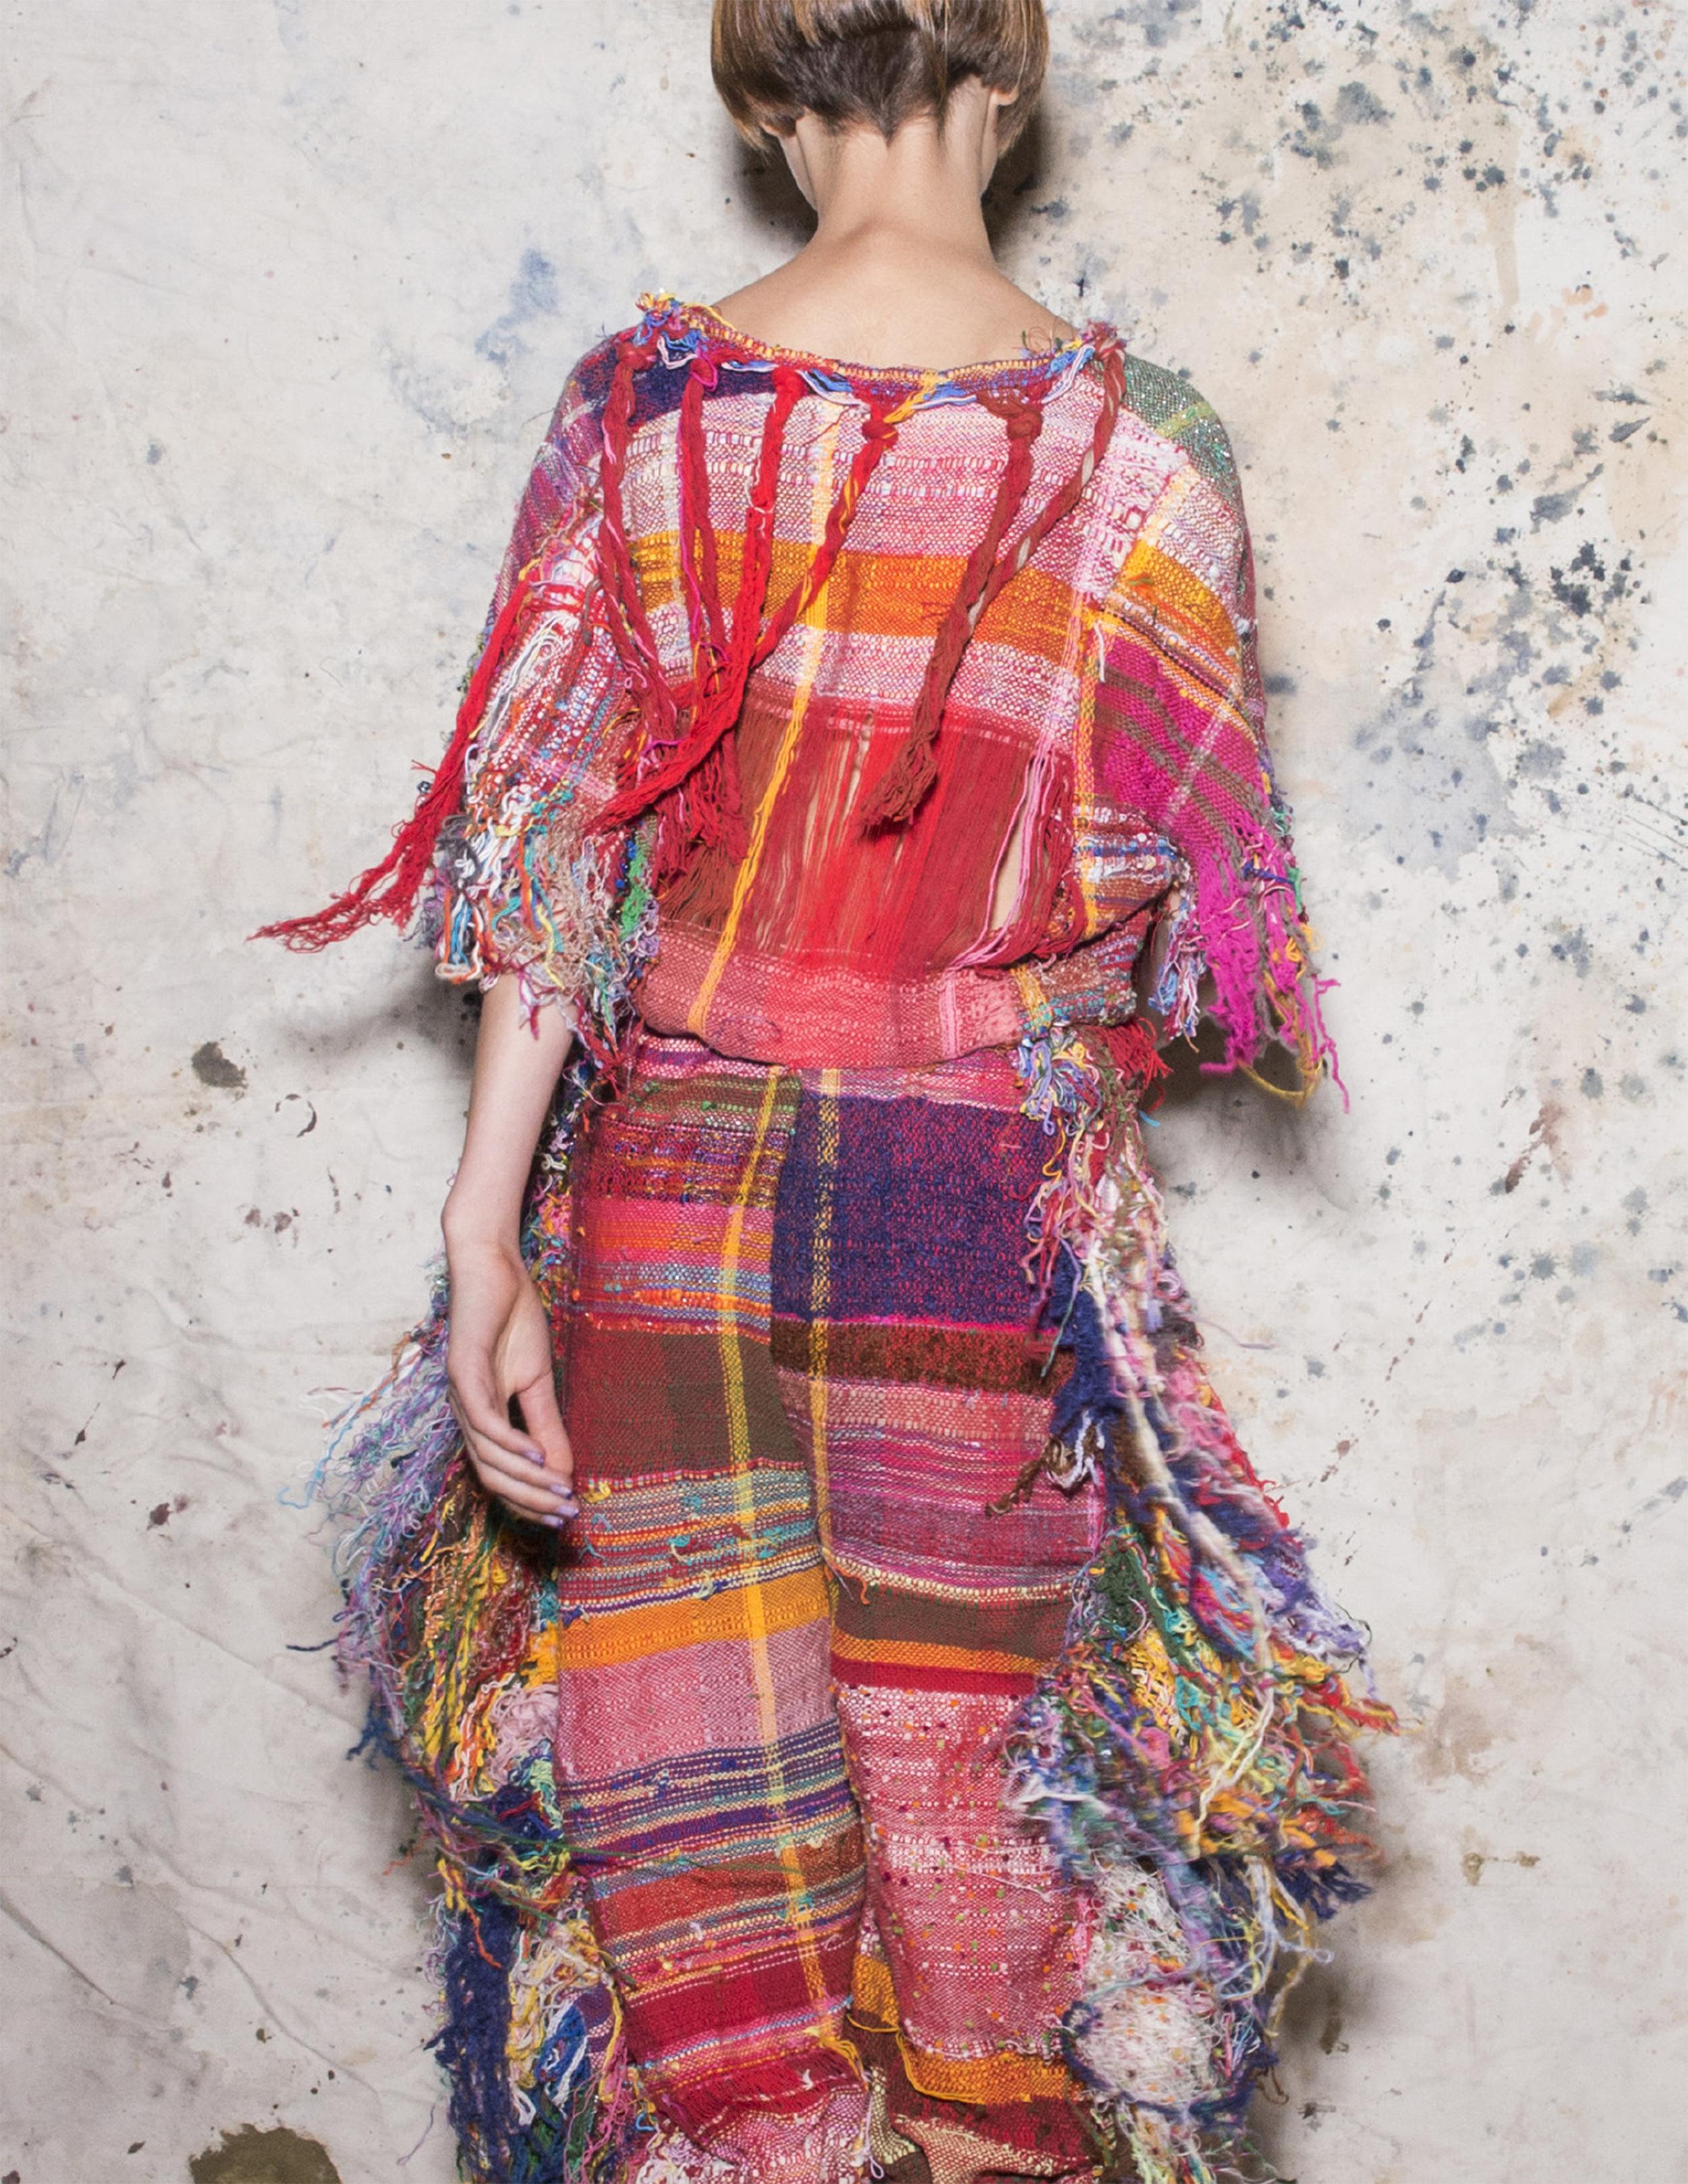 Designer - Taylor McMahon/Weaver- Kazuko Ito